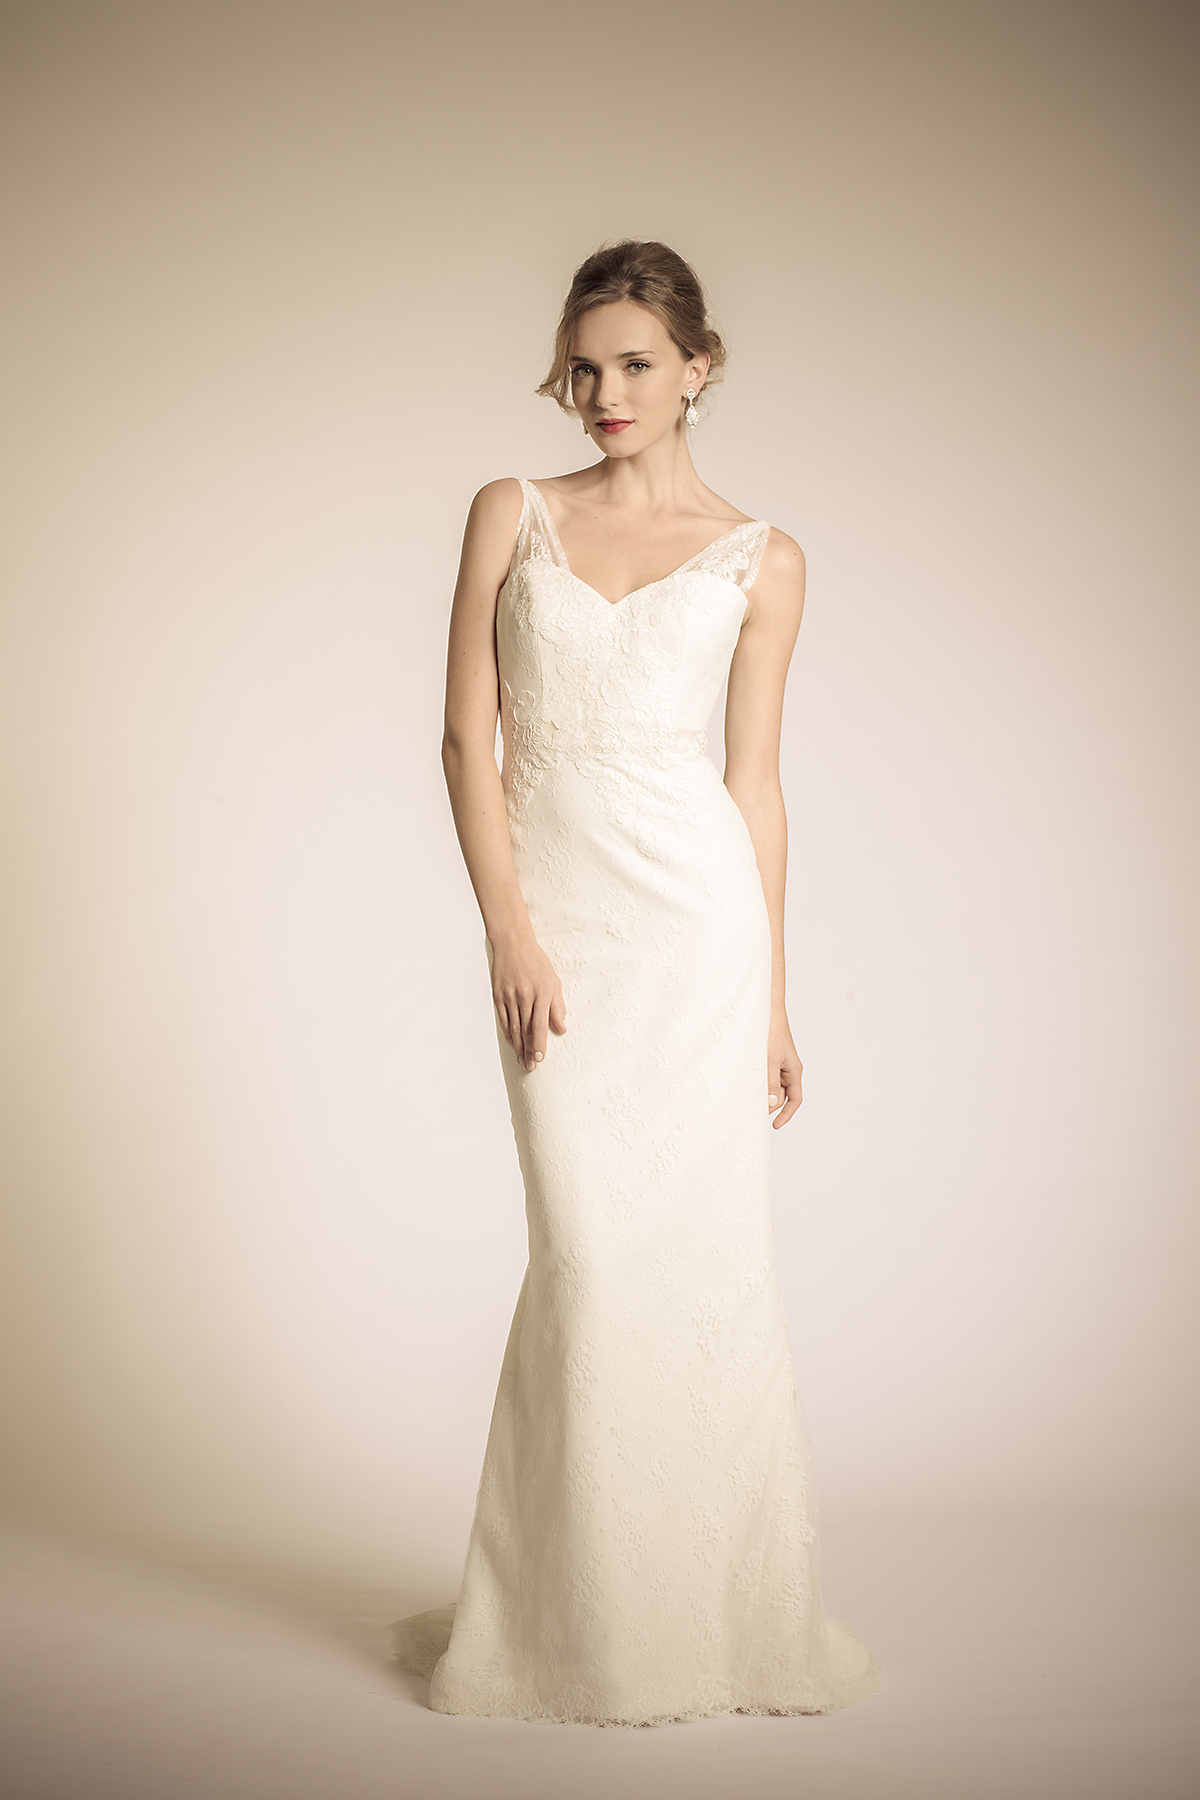 amy wedding dresses photo - 1